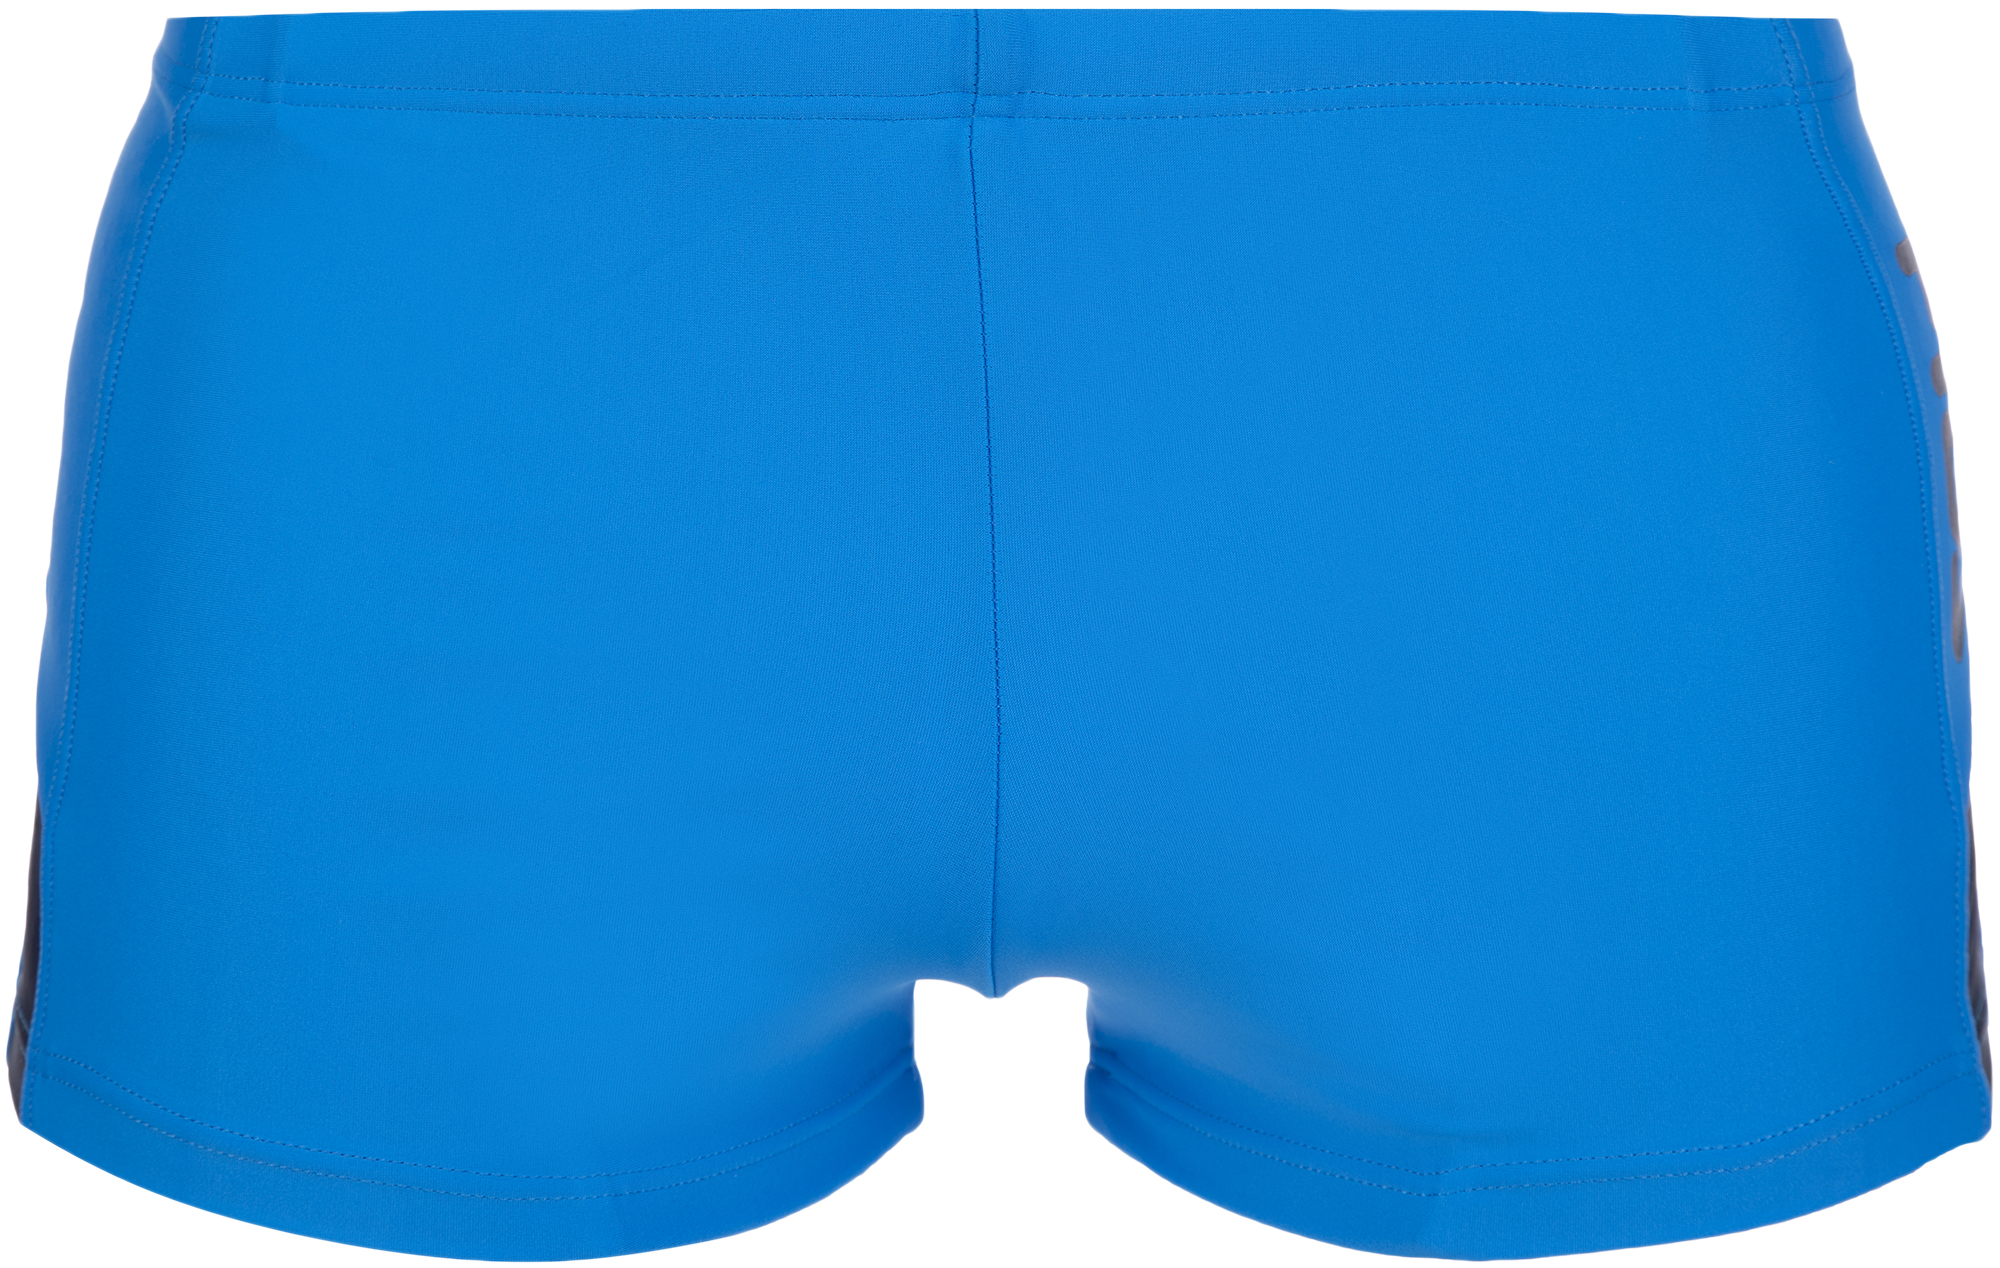 Fila Плавки-шорты мужские Fila, размер 56